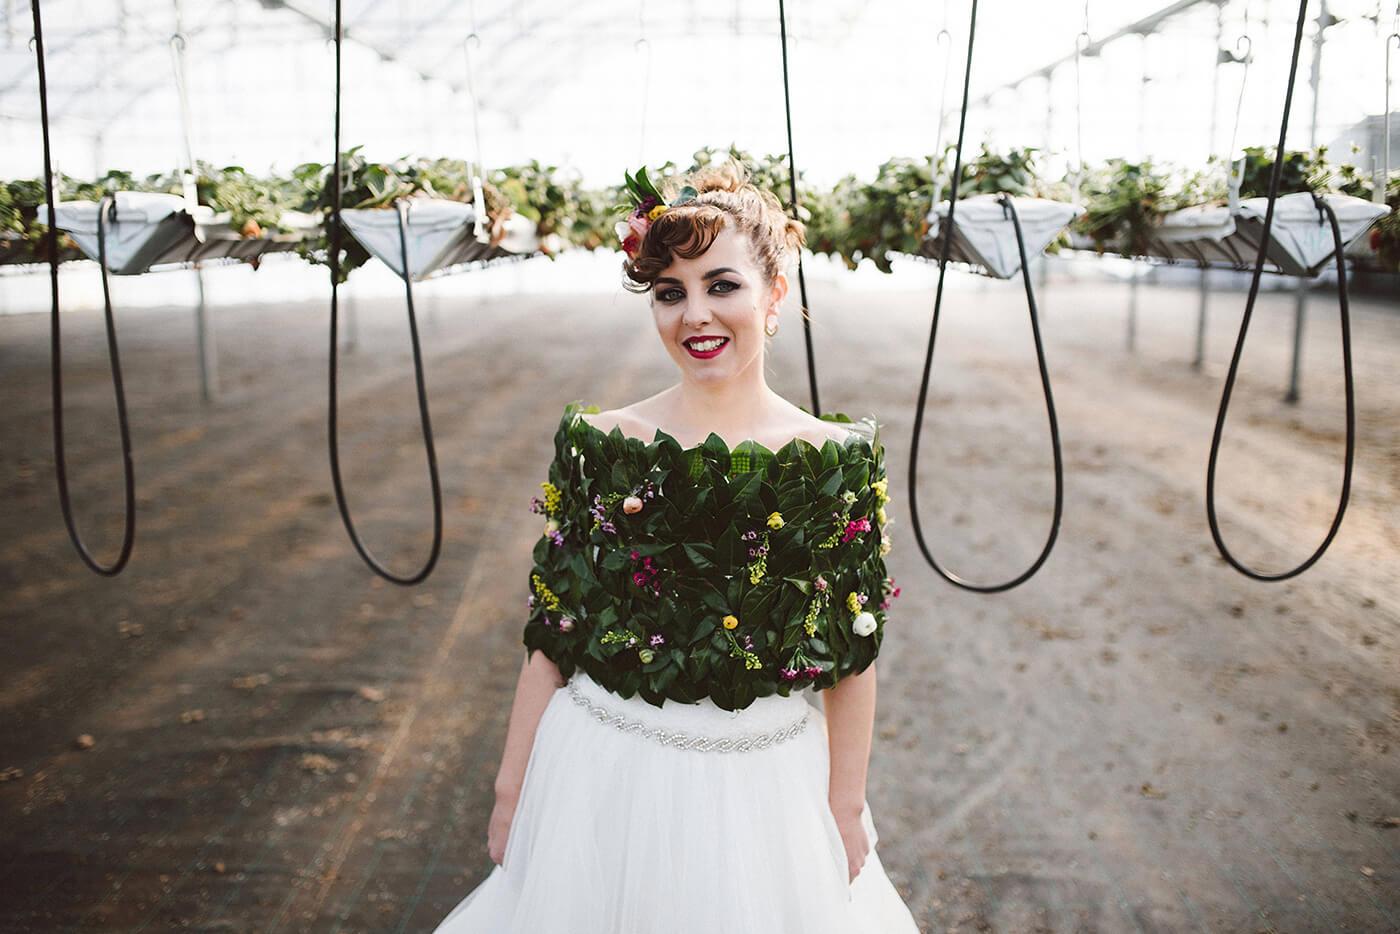 roma-organizacao-eventos-editorial-mid-century-modern-wedding-in-a-strawberry-field-22